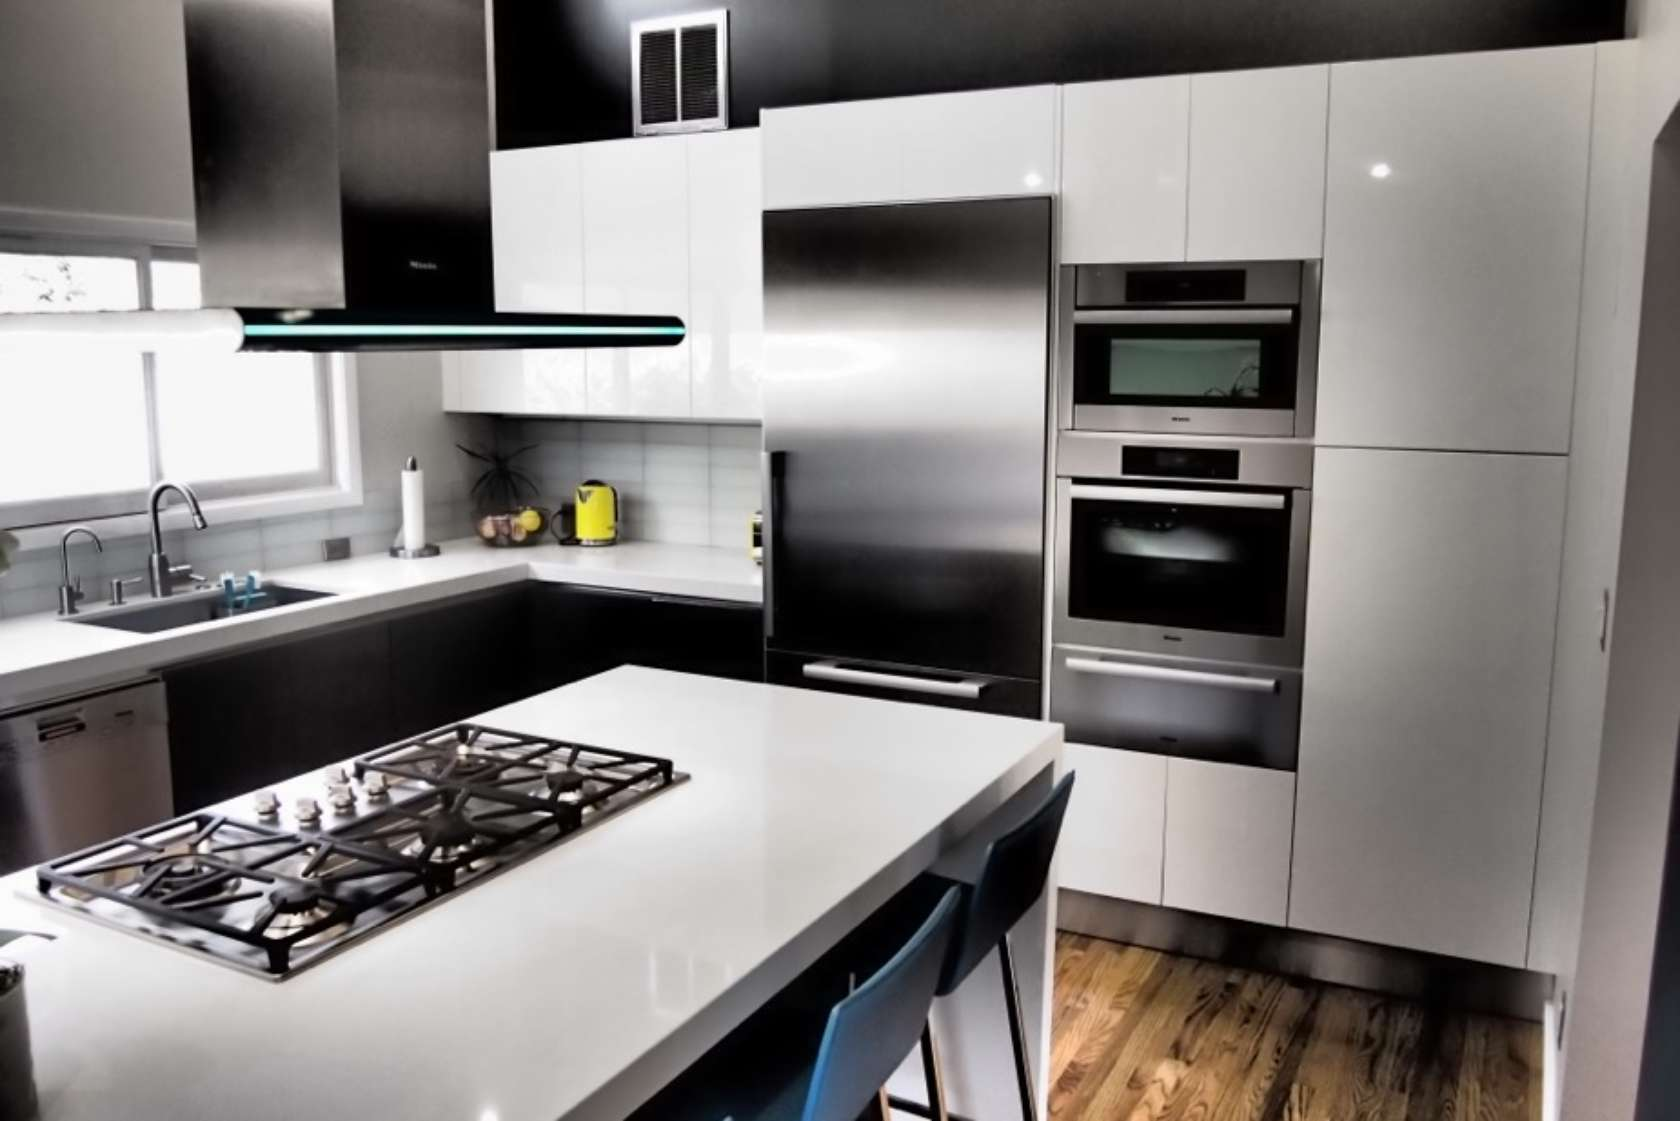 Miele kitchen by jorge martinez architizer for Miele küchen